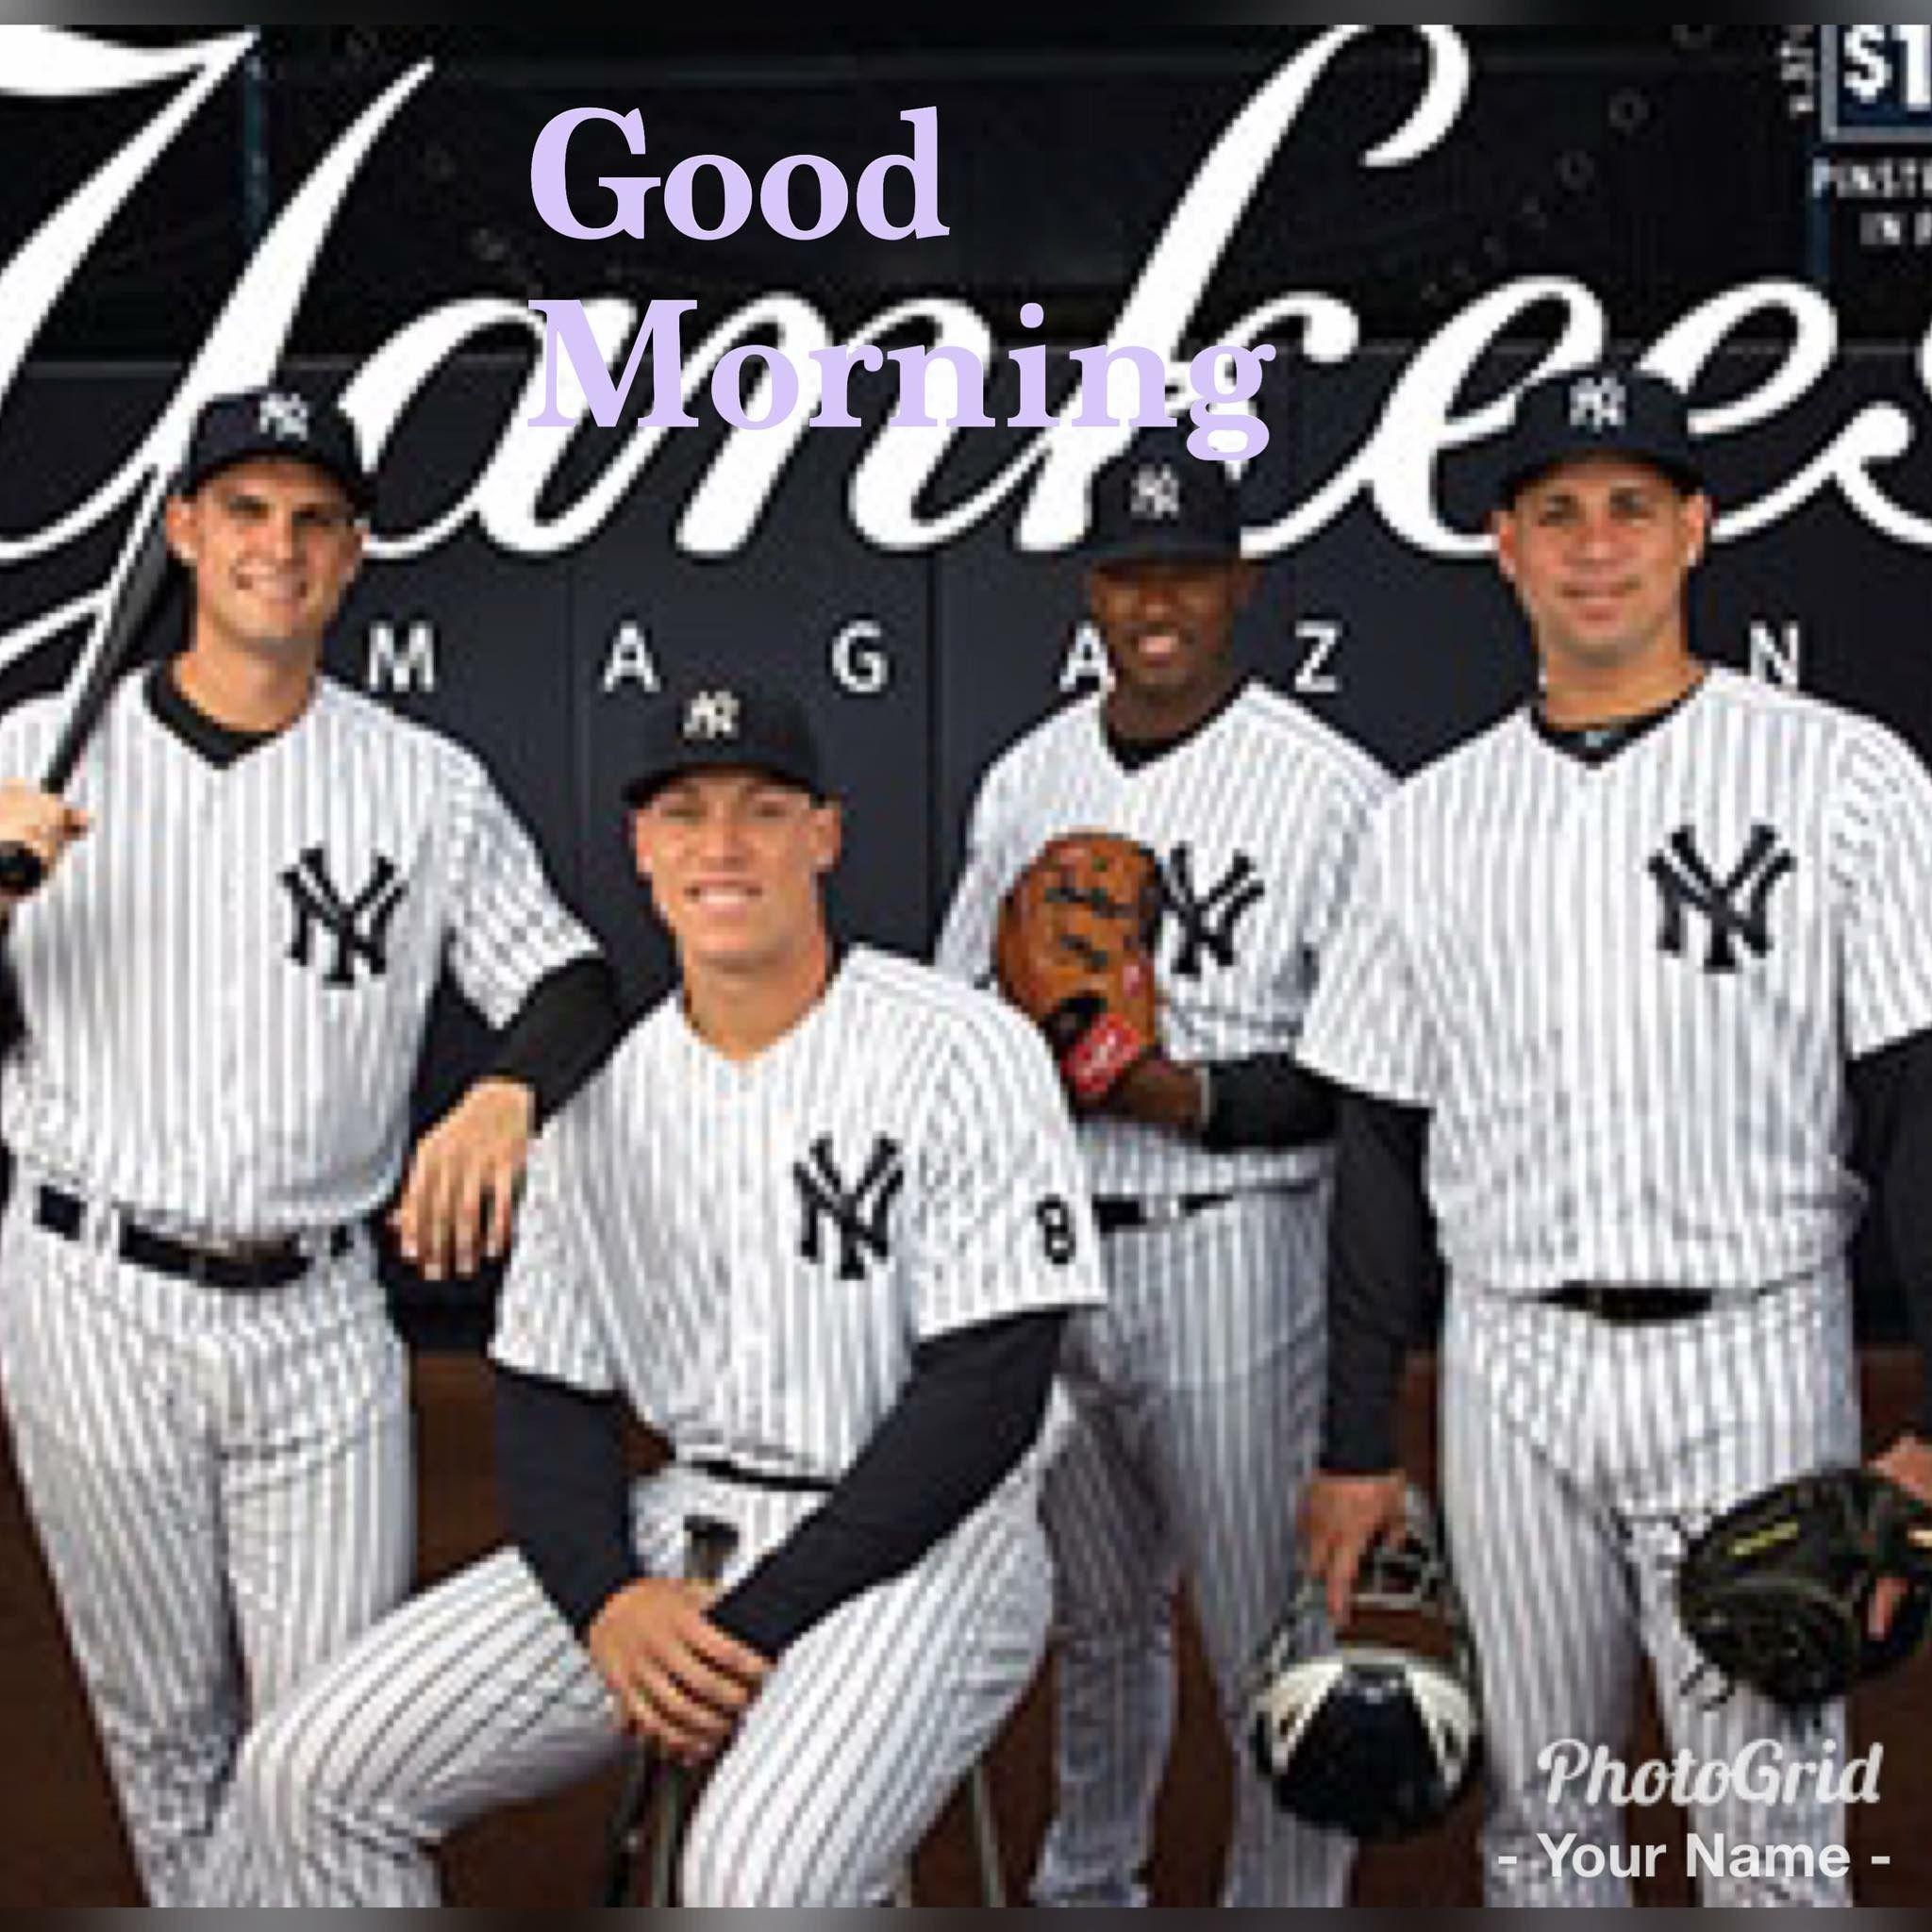 Pin By Jeni Carrizosa On Places To Visit New York Yankees Yankees News Ny Yankees